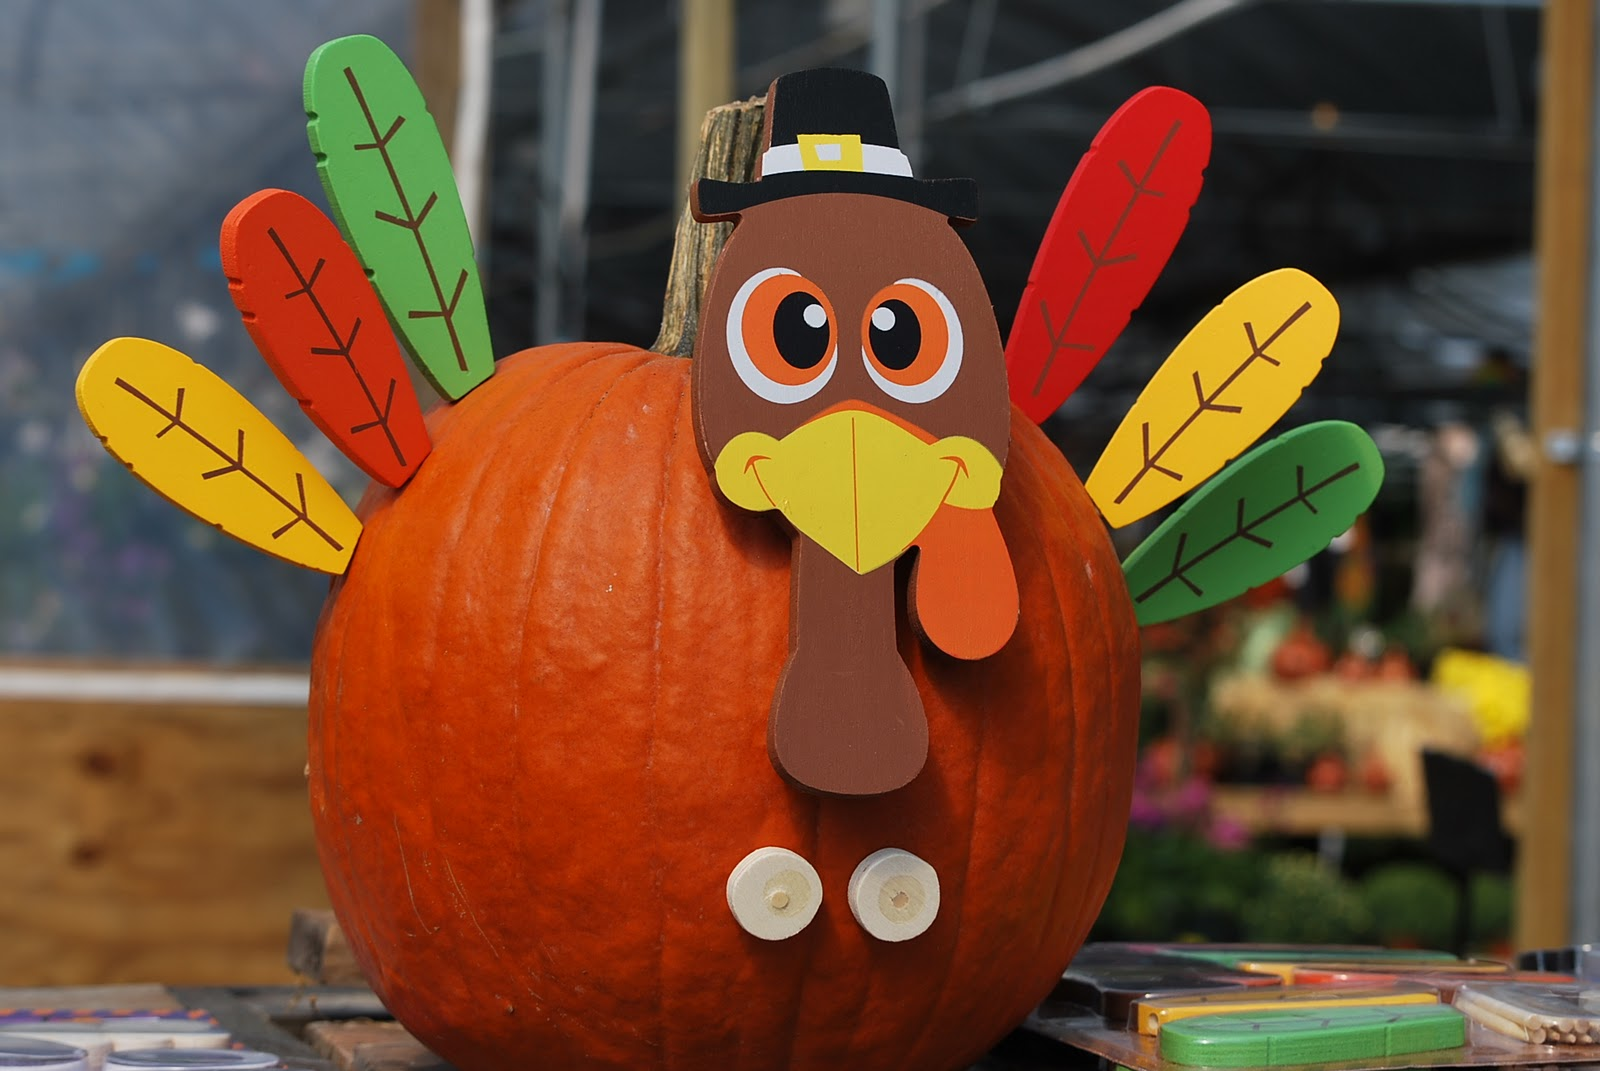 A Pumpkin Like A Turkey